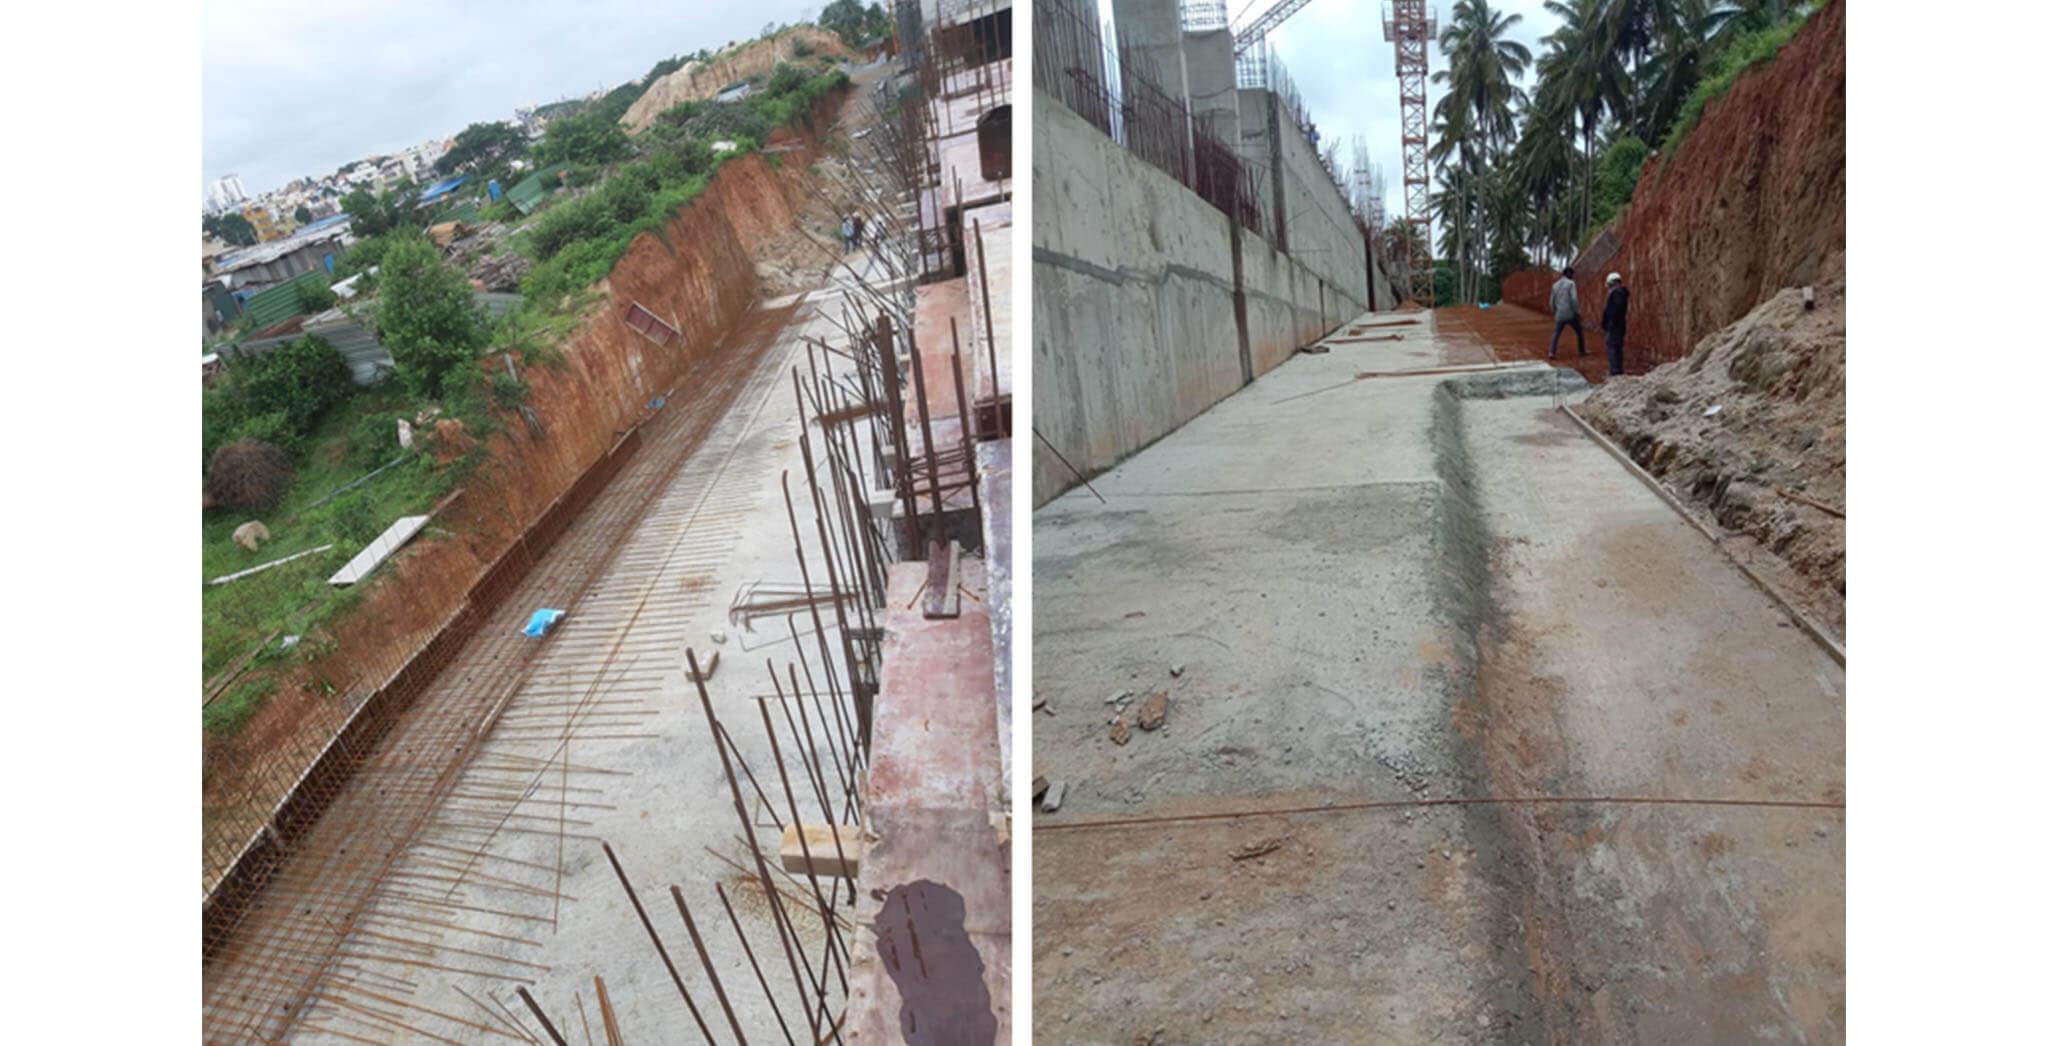 Aug 2020 - South side ramp work-in-progress